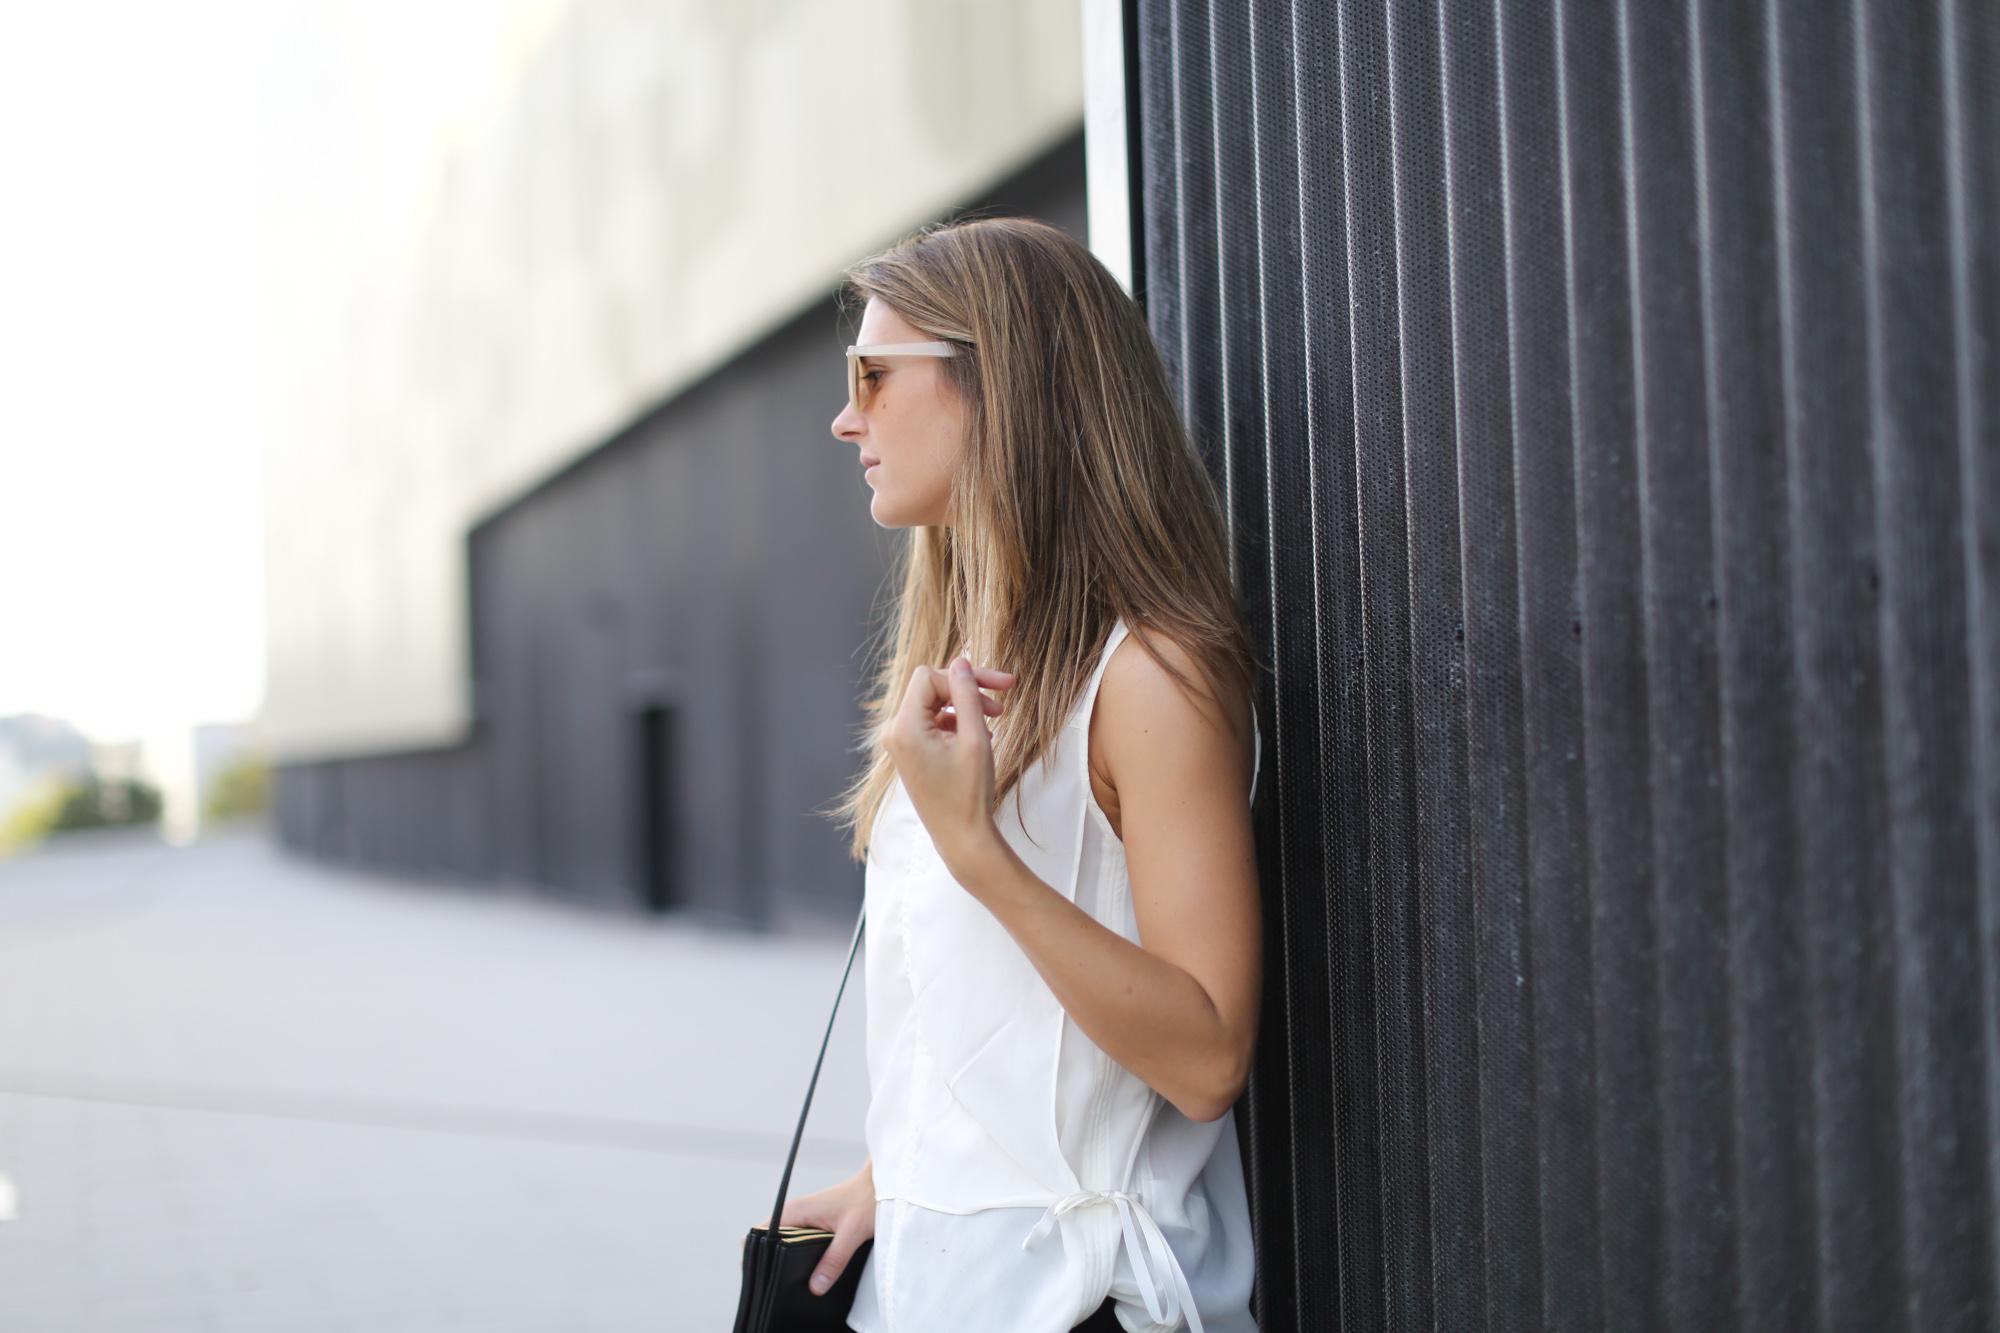 Clochet-streetstyle-zara-mini-pleated-skirt-adidas-stan-smith-5